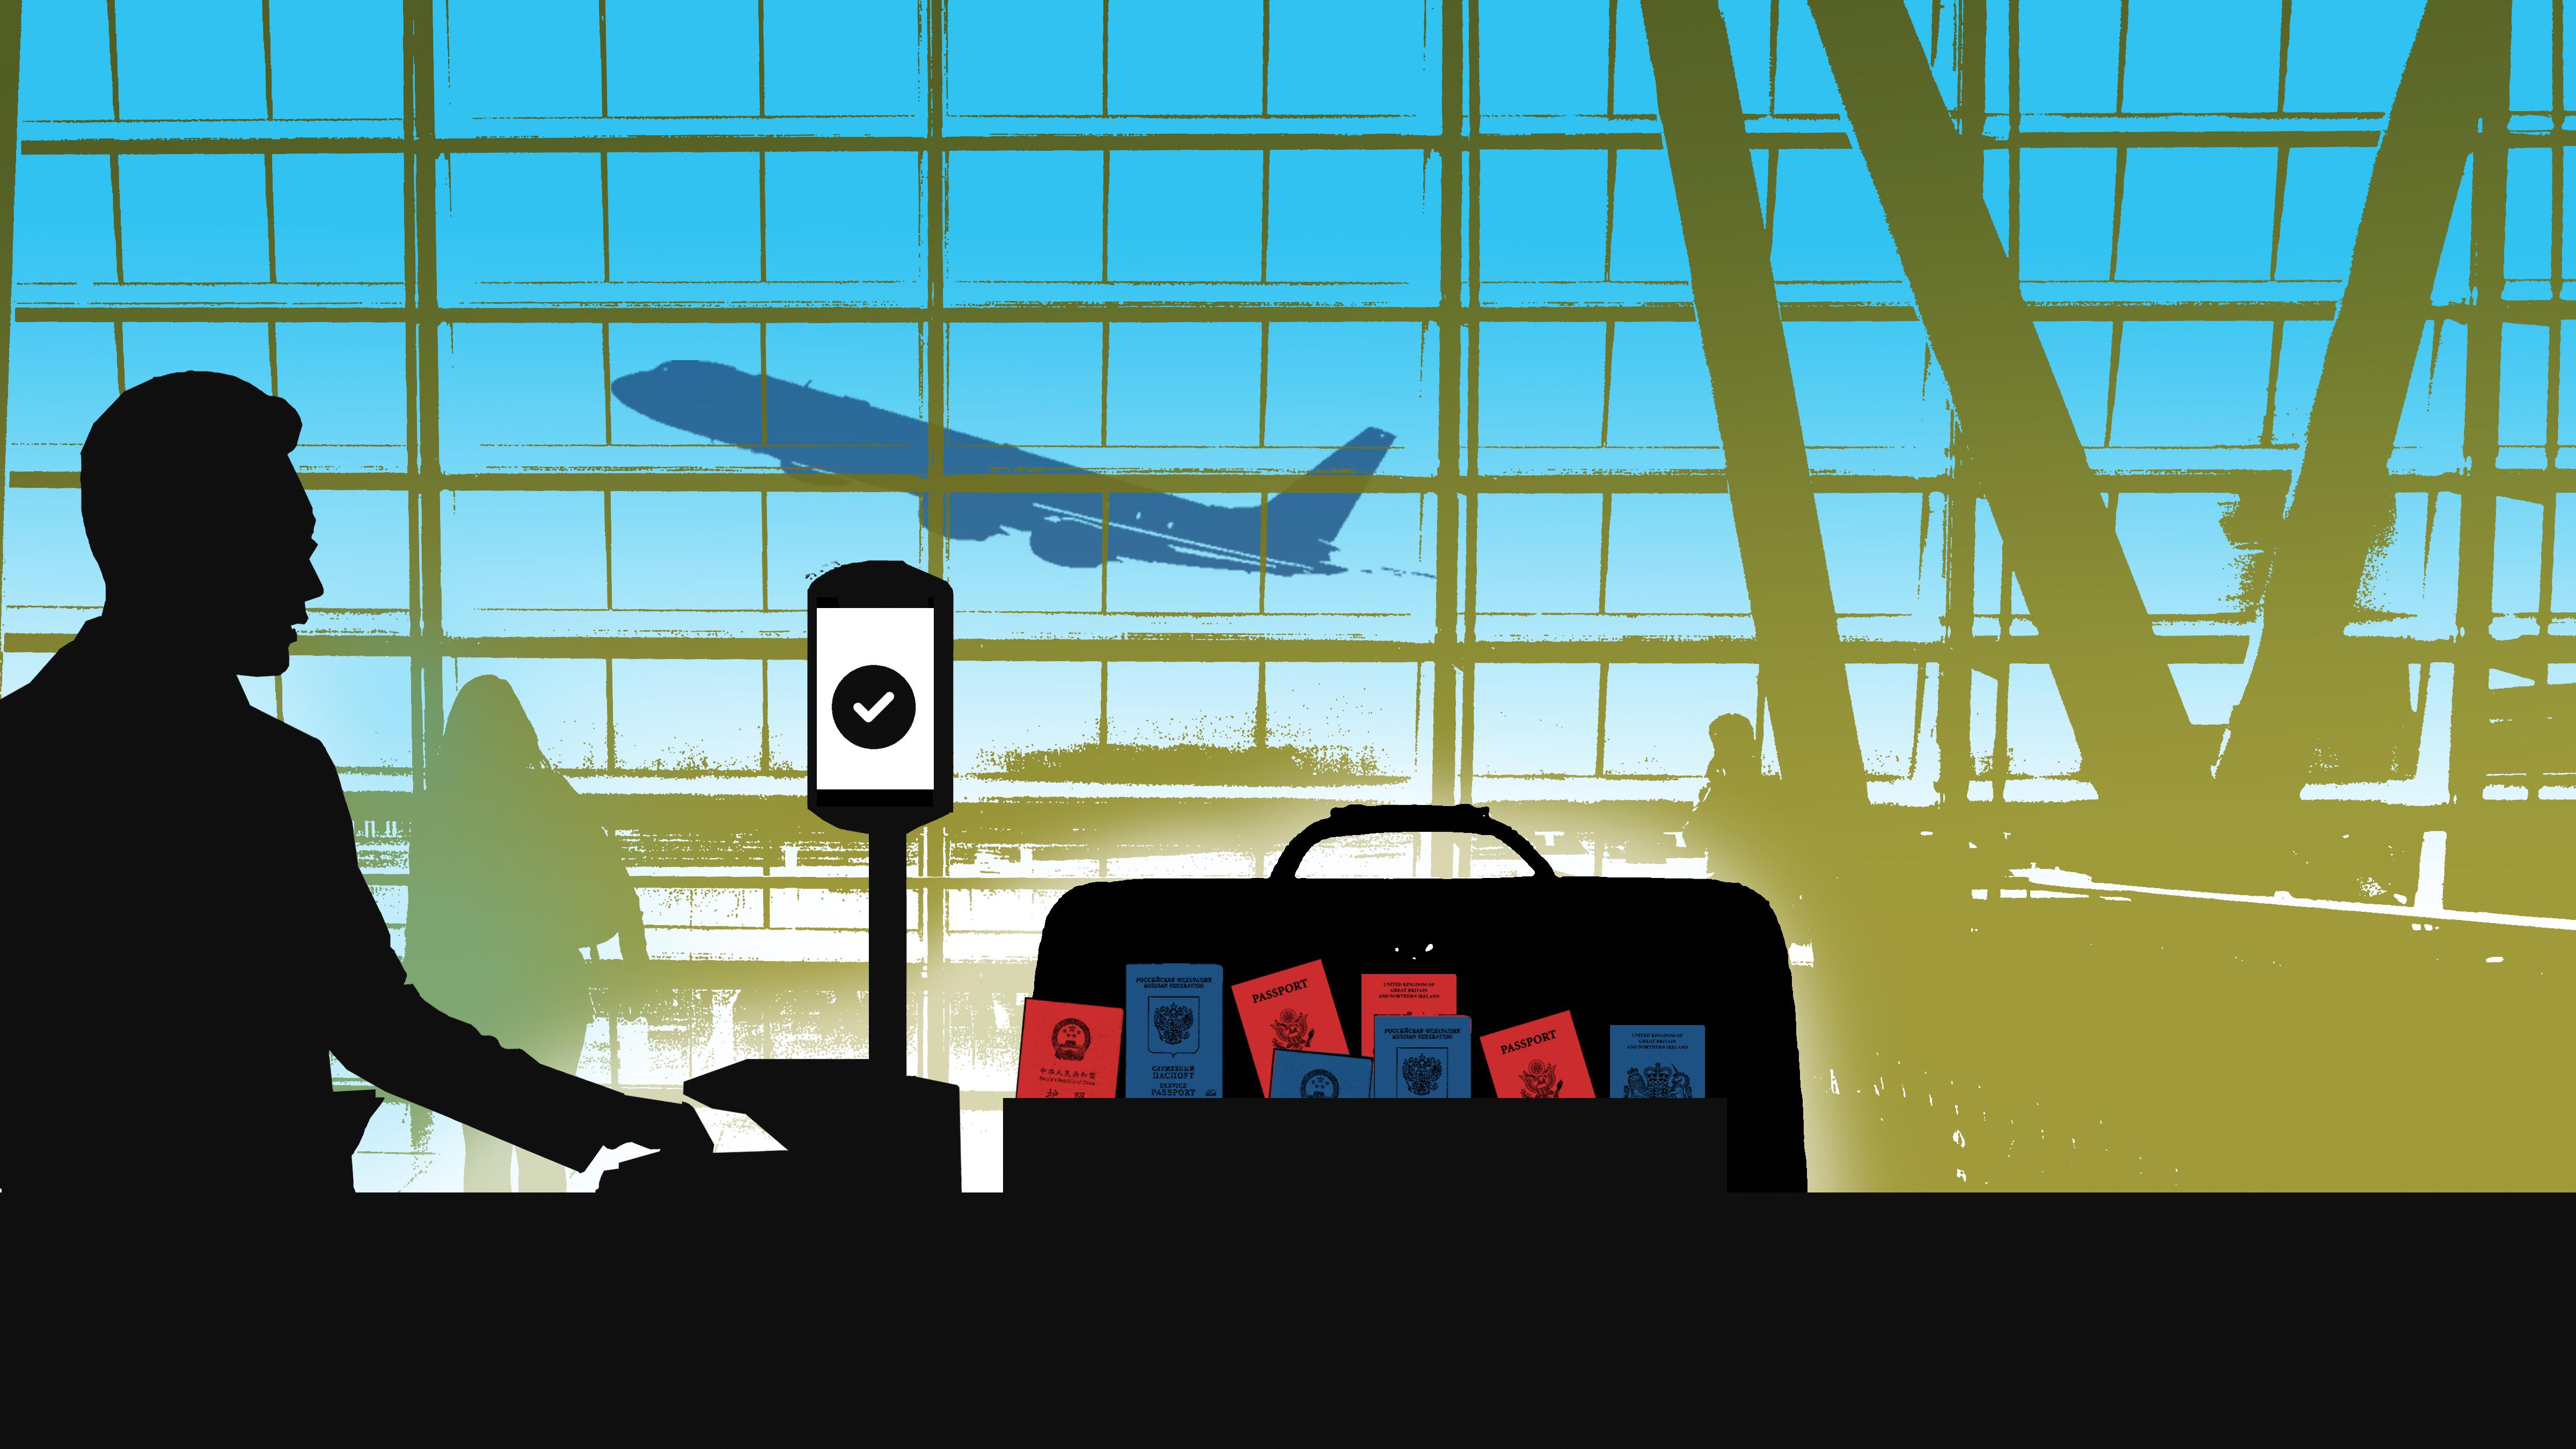 Illustration by Shonagh Rae for Yahoo News